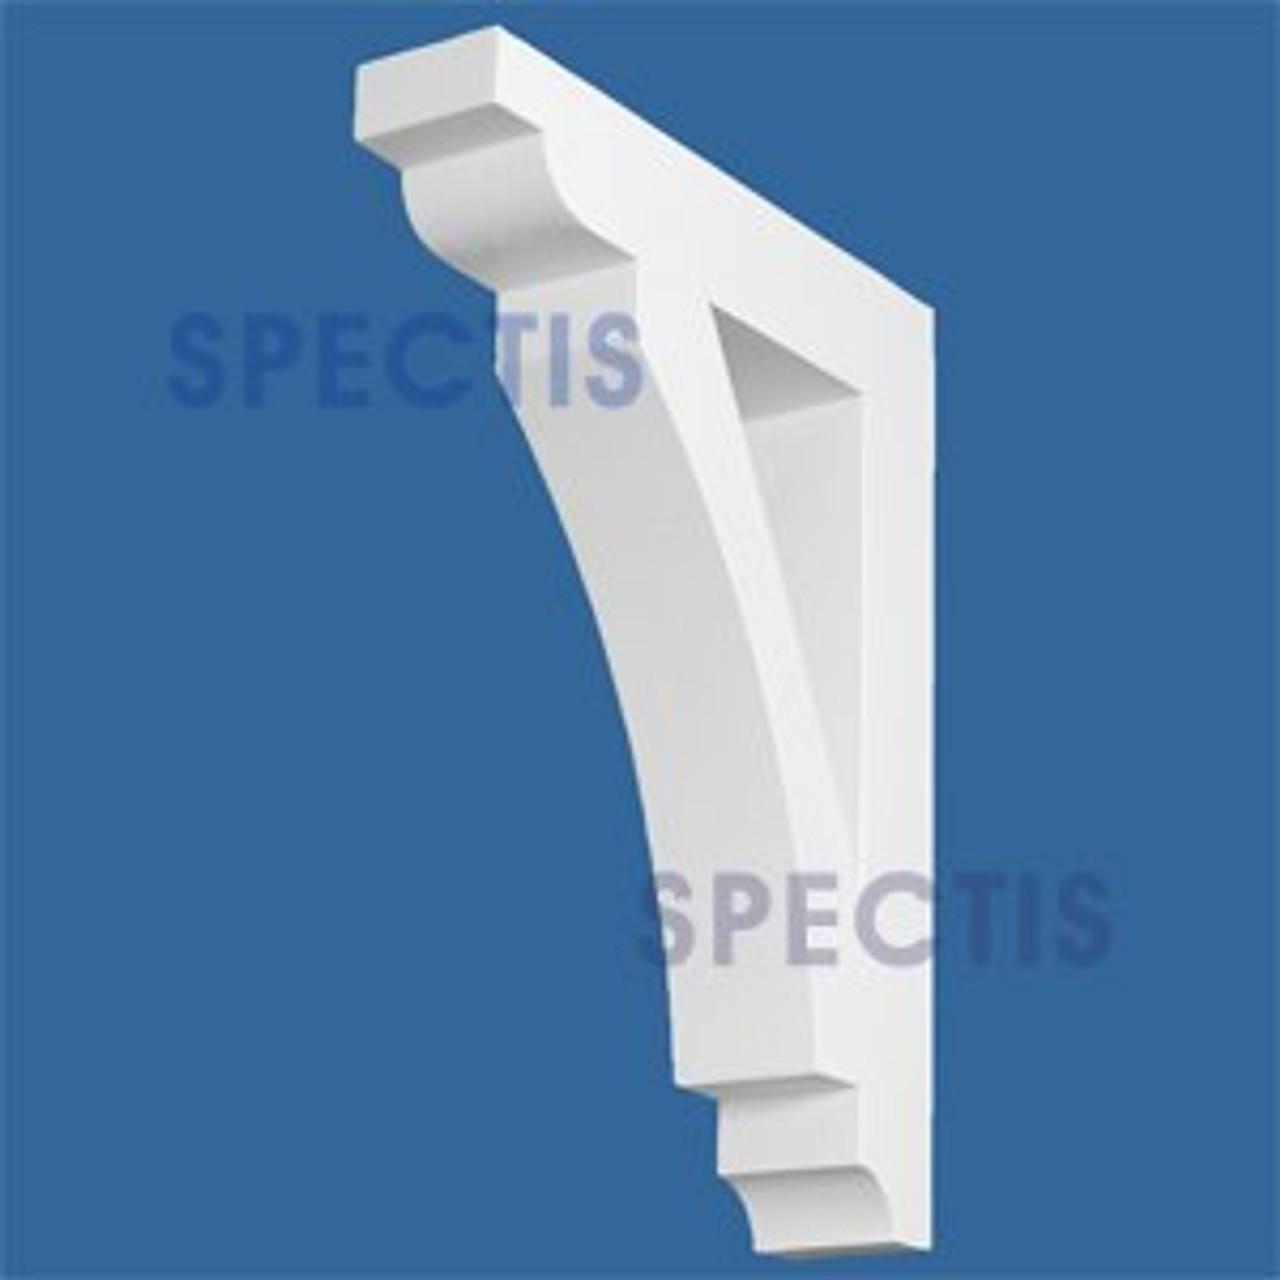 "BL2869 Corbel Block or Eave Bracket 4""W x 24""H x 18.5"" P"